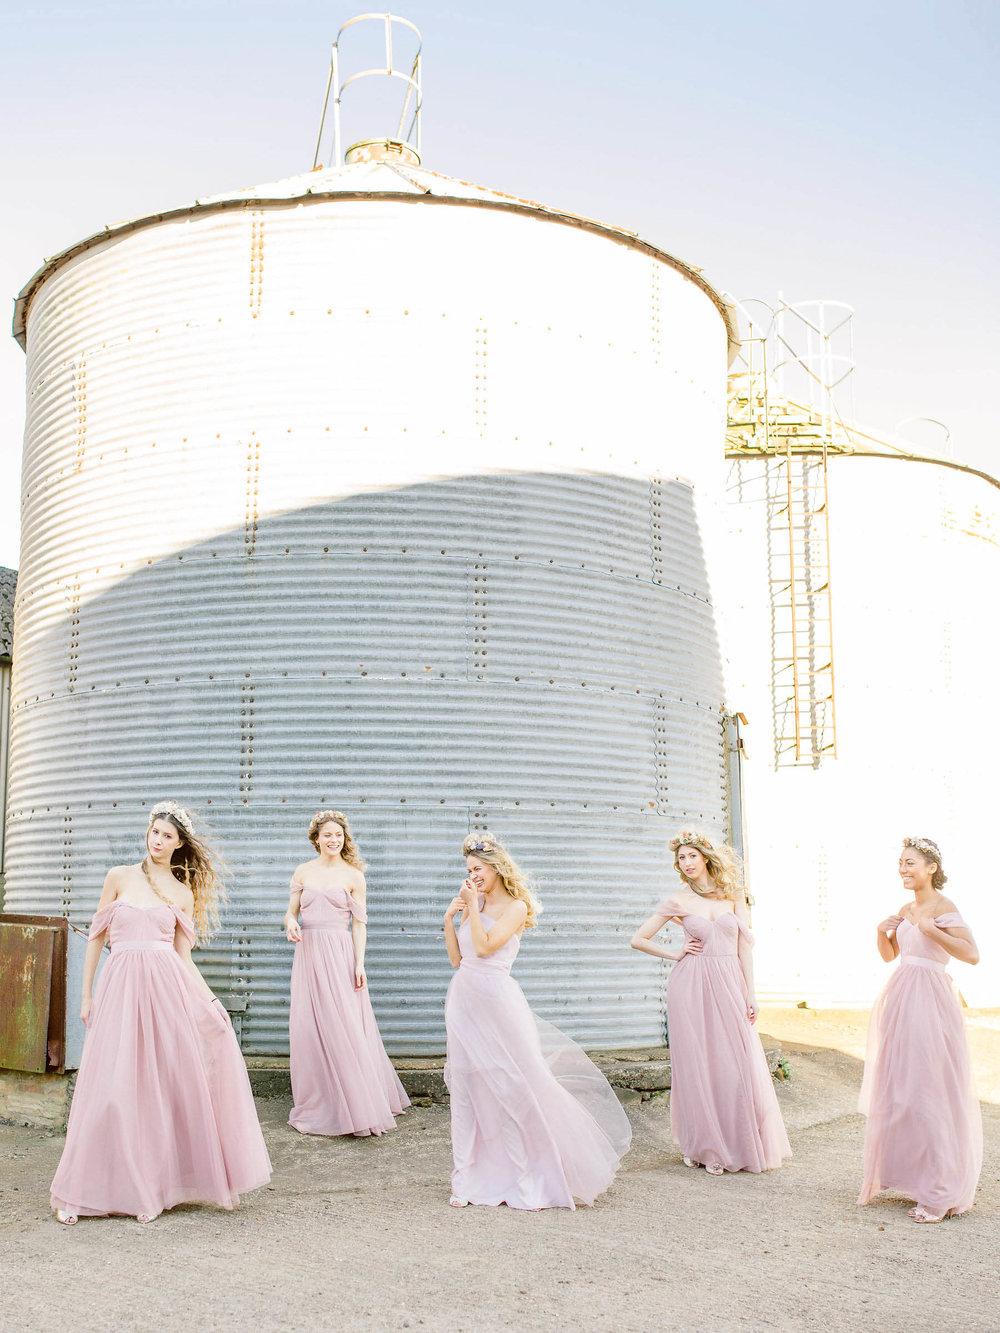 Amy O'Boyle Photography- Destination & UK Fine Art Film Wedding Photographer- TH&TH Bridesmaid Dress Shoot-24.jpg